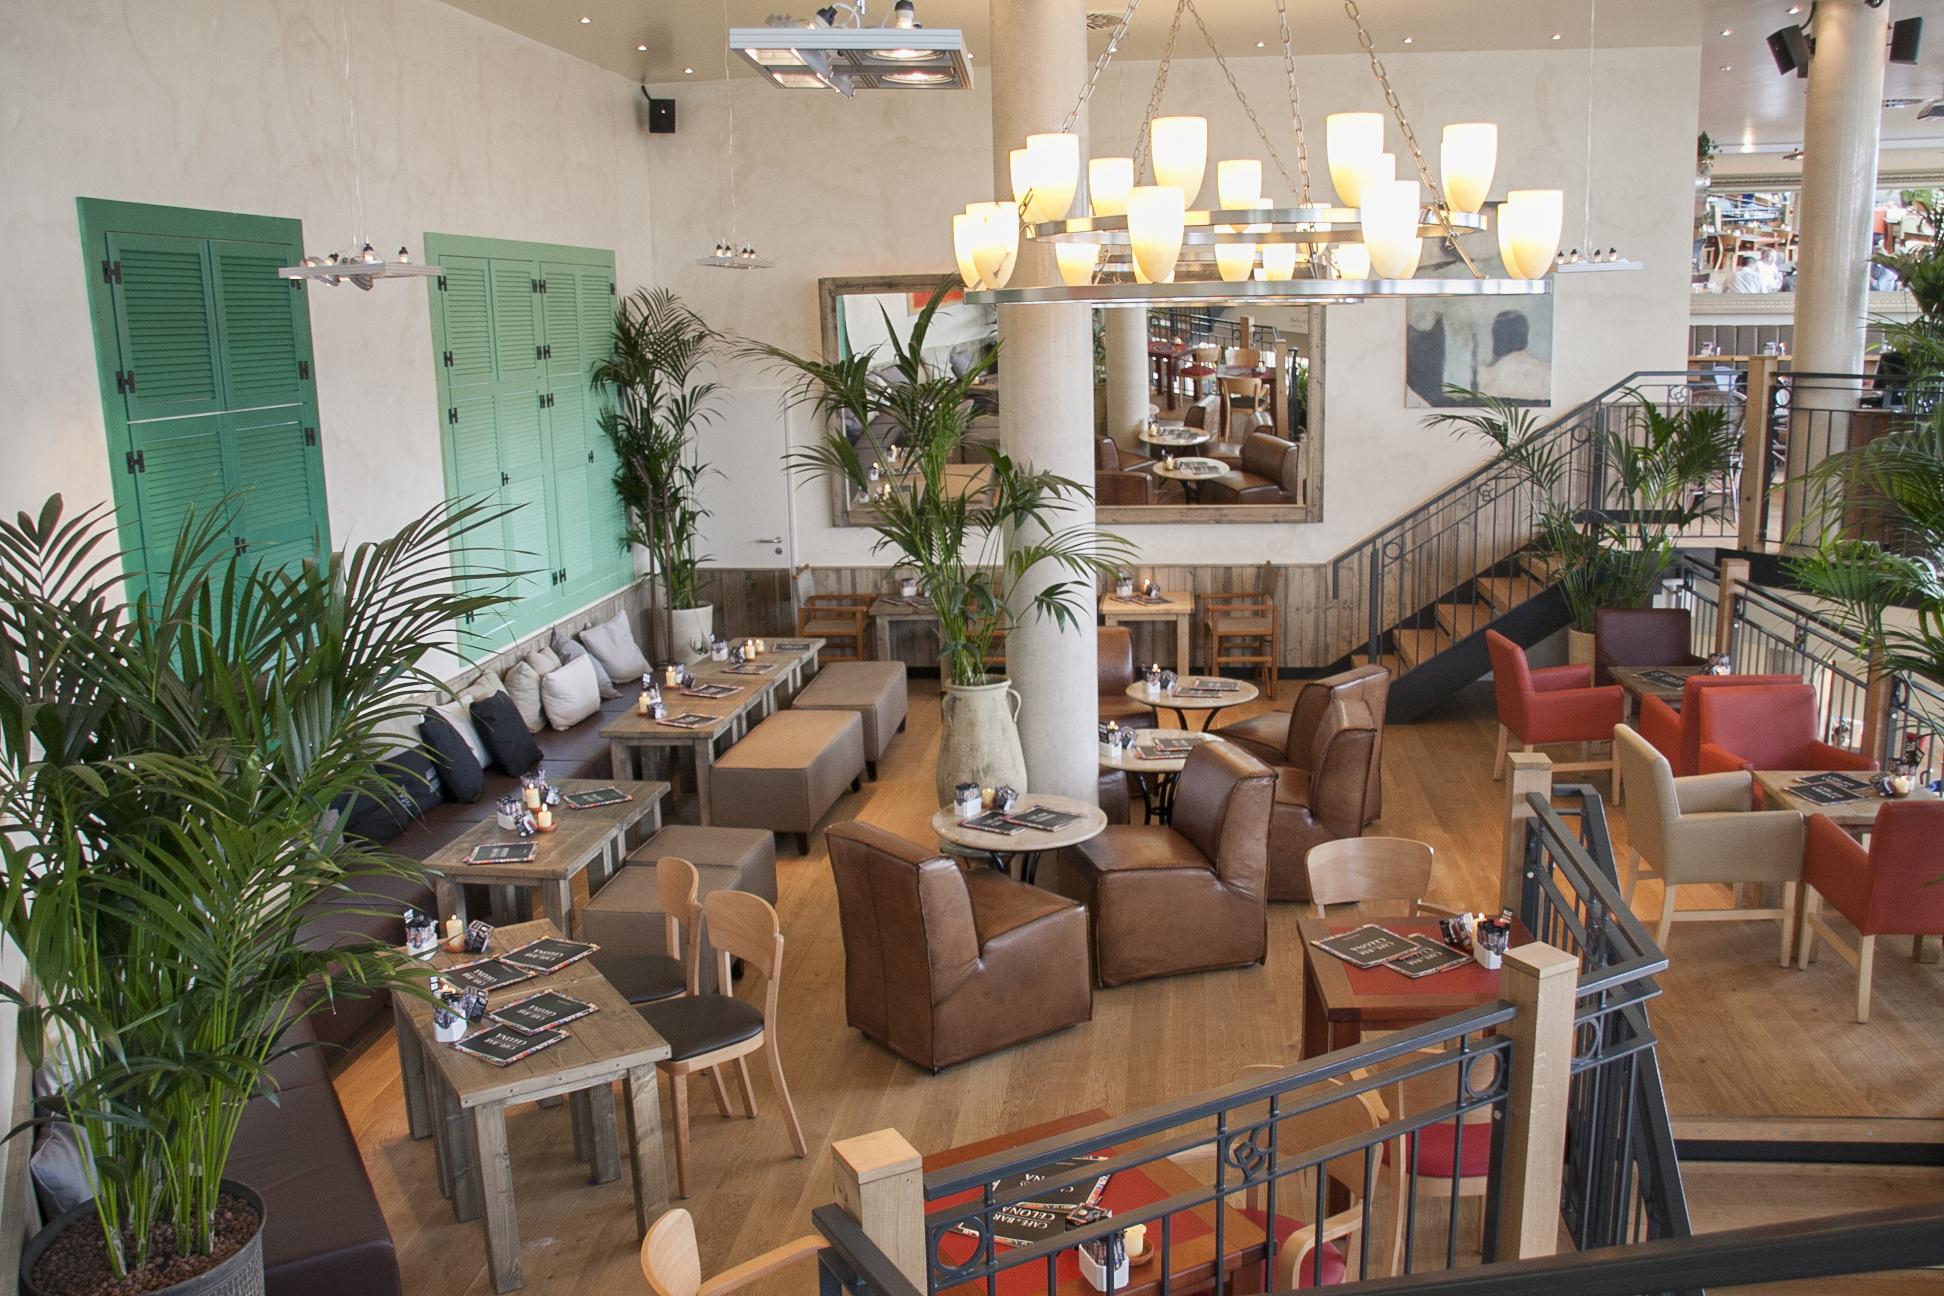 Wohnzimmer Cafe Karlsruhe Abomaheber